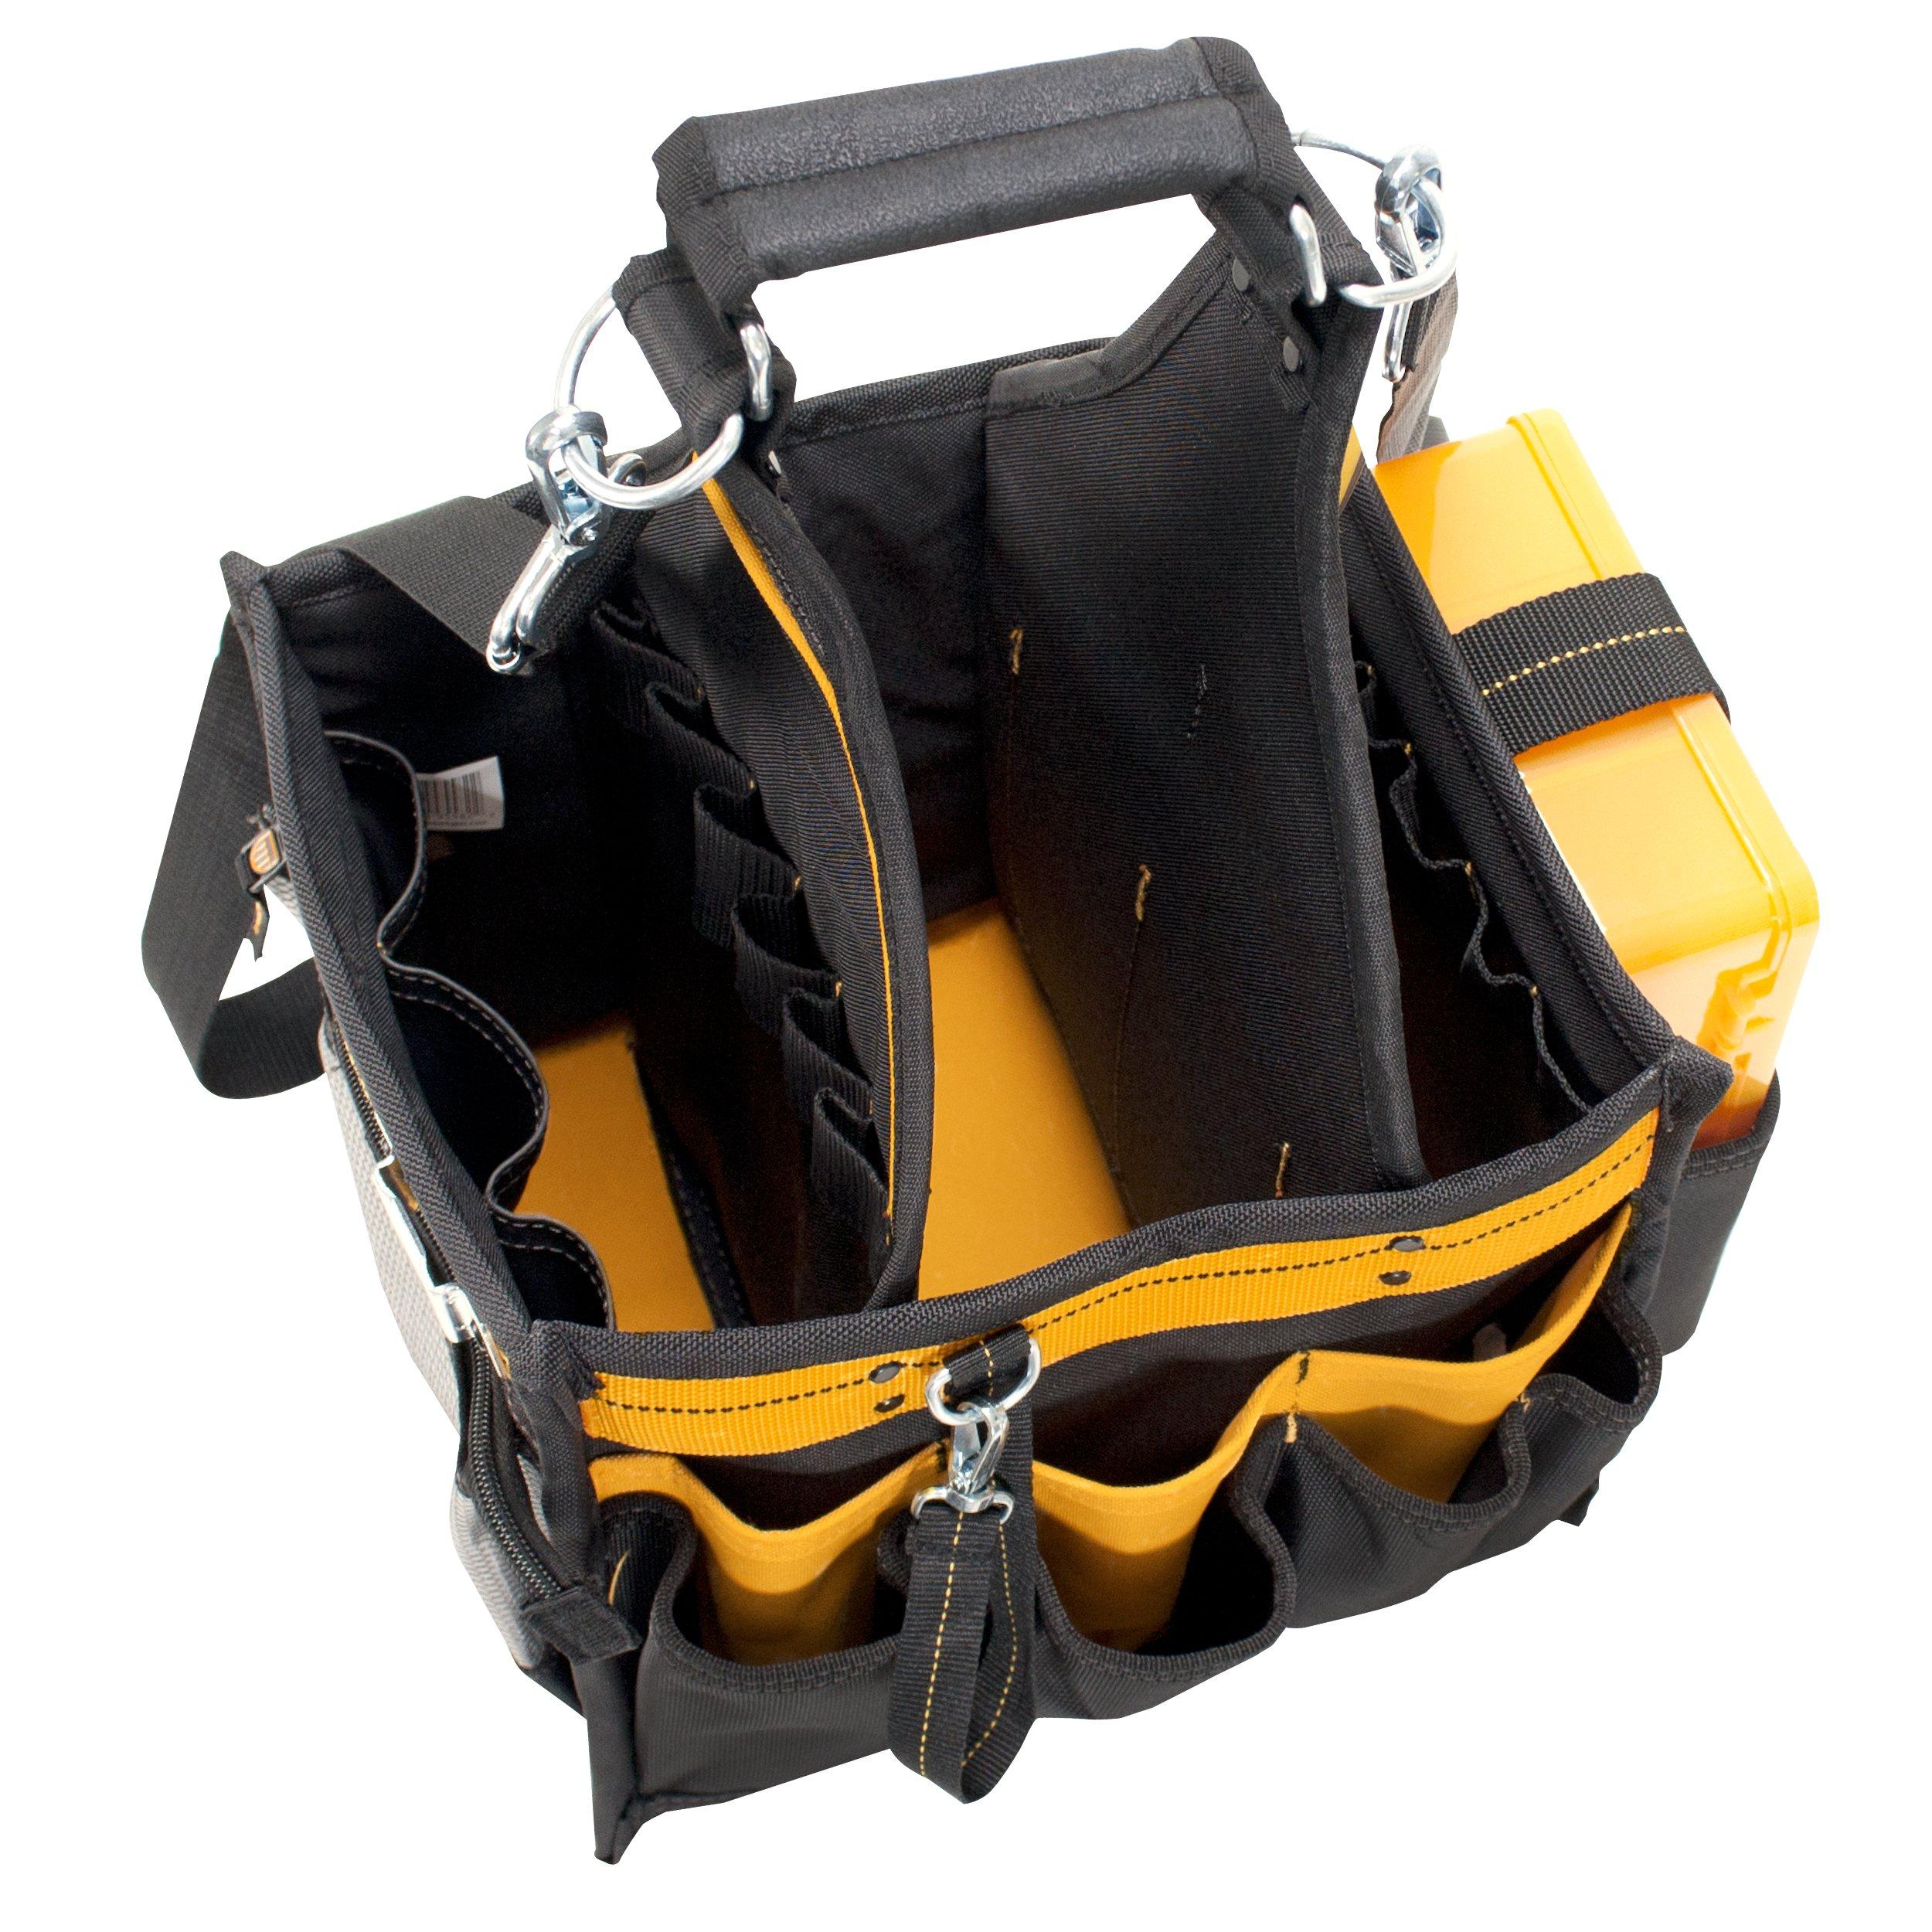 DEWALT DG5582 Electrical and Maintenance Tool Carrier & Parts Tray, 11 In., 23 Pocket by DEWALT